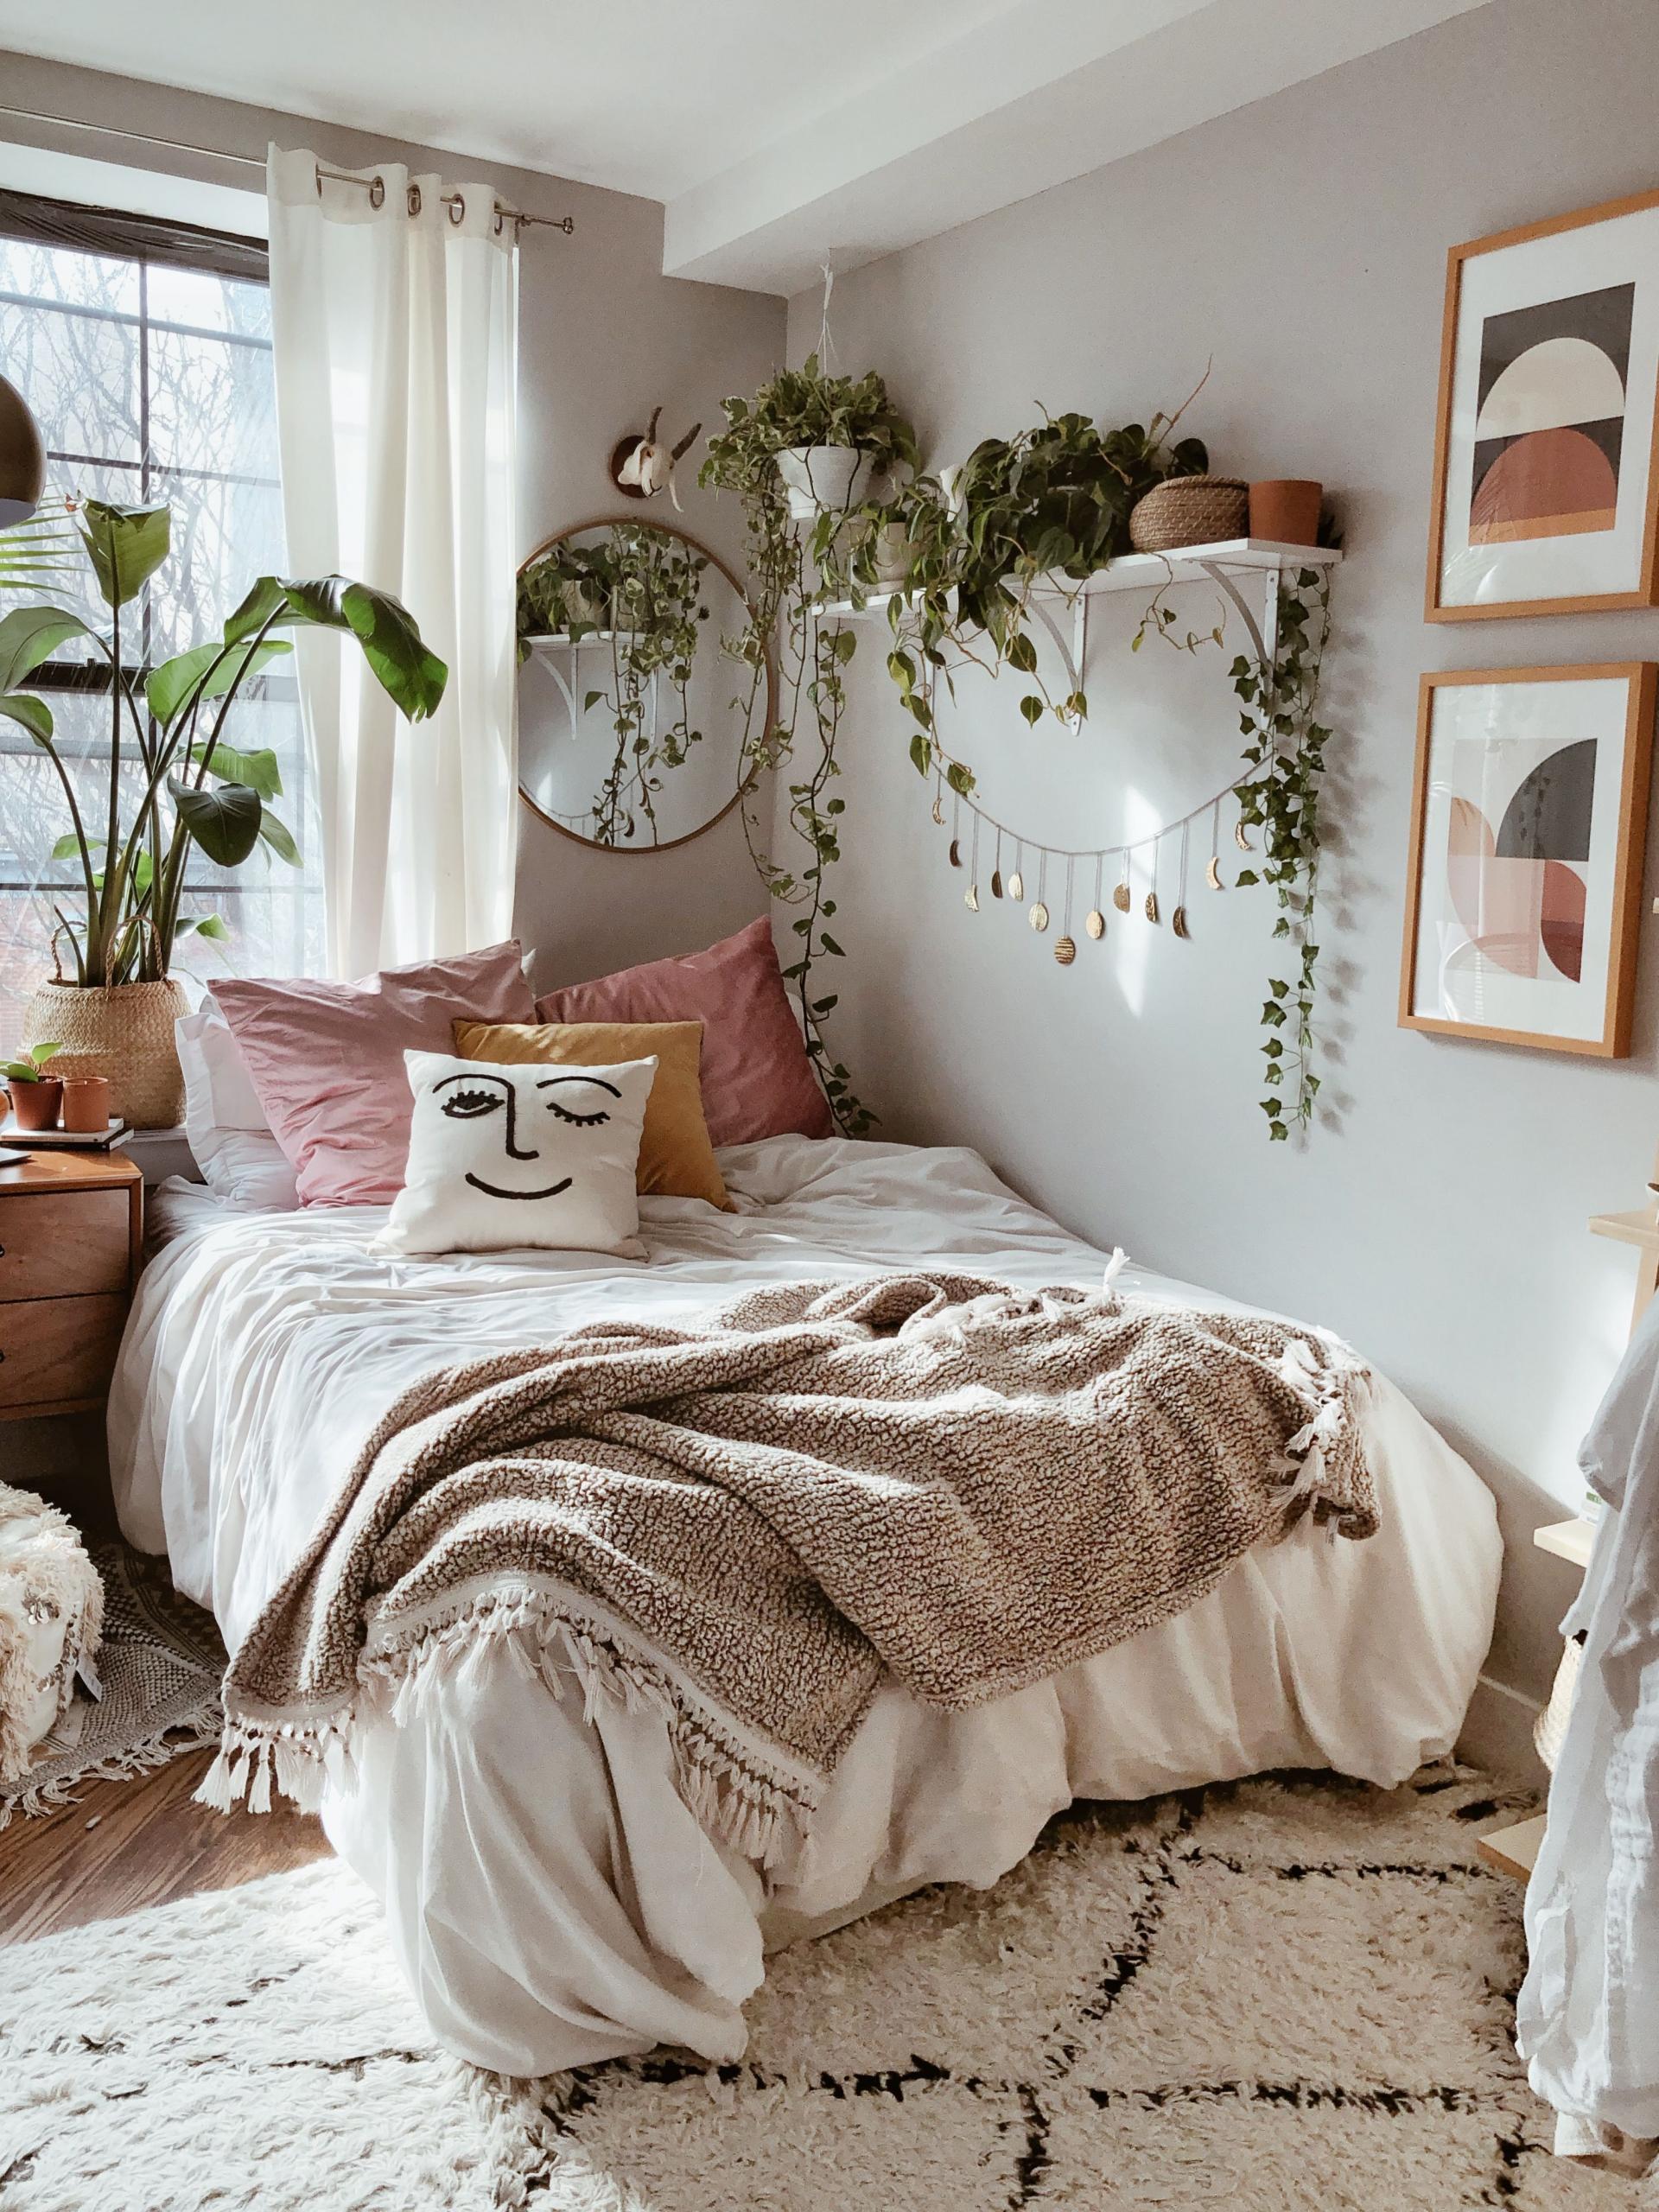 New Boho Bedroom Decor Hippie Small Spaces #BEDROOM Boho ...